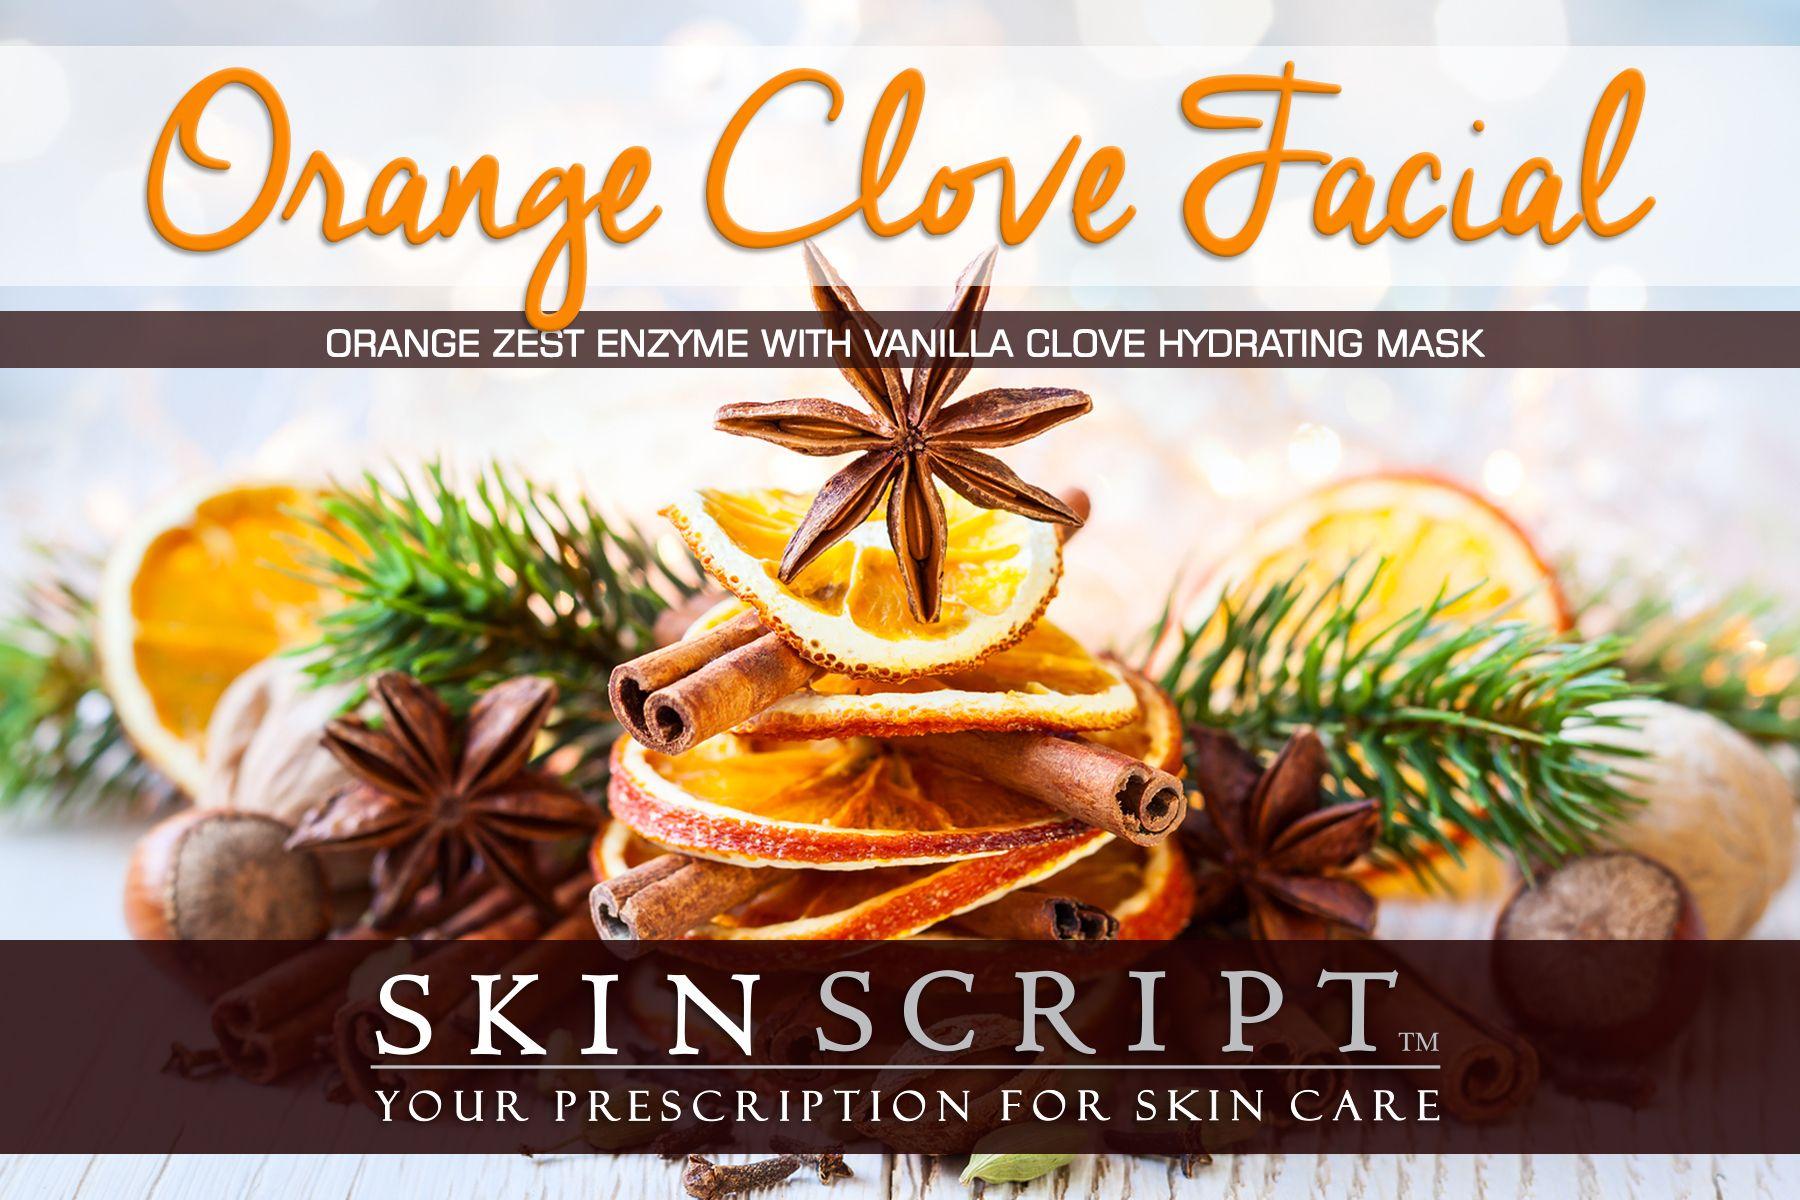 Orange-Clove-Facial_4x6_2_HR.jpg